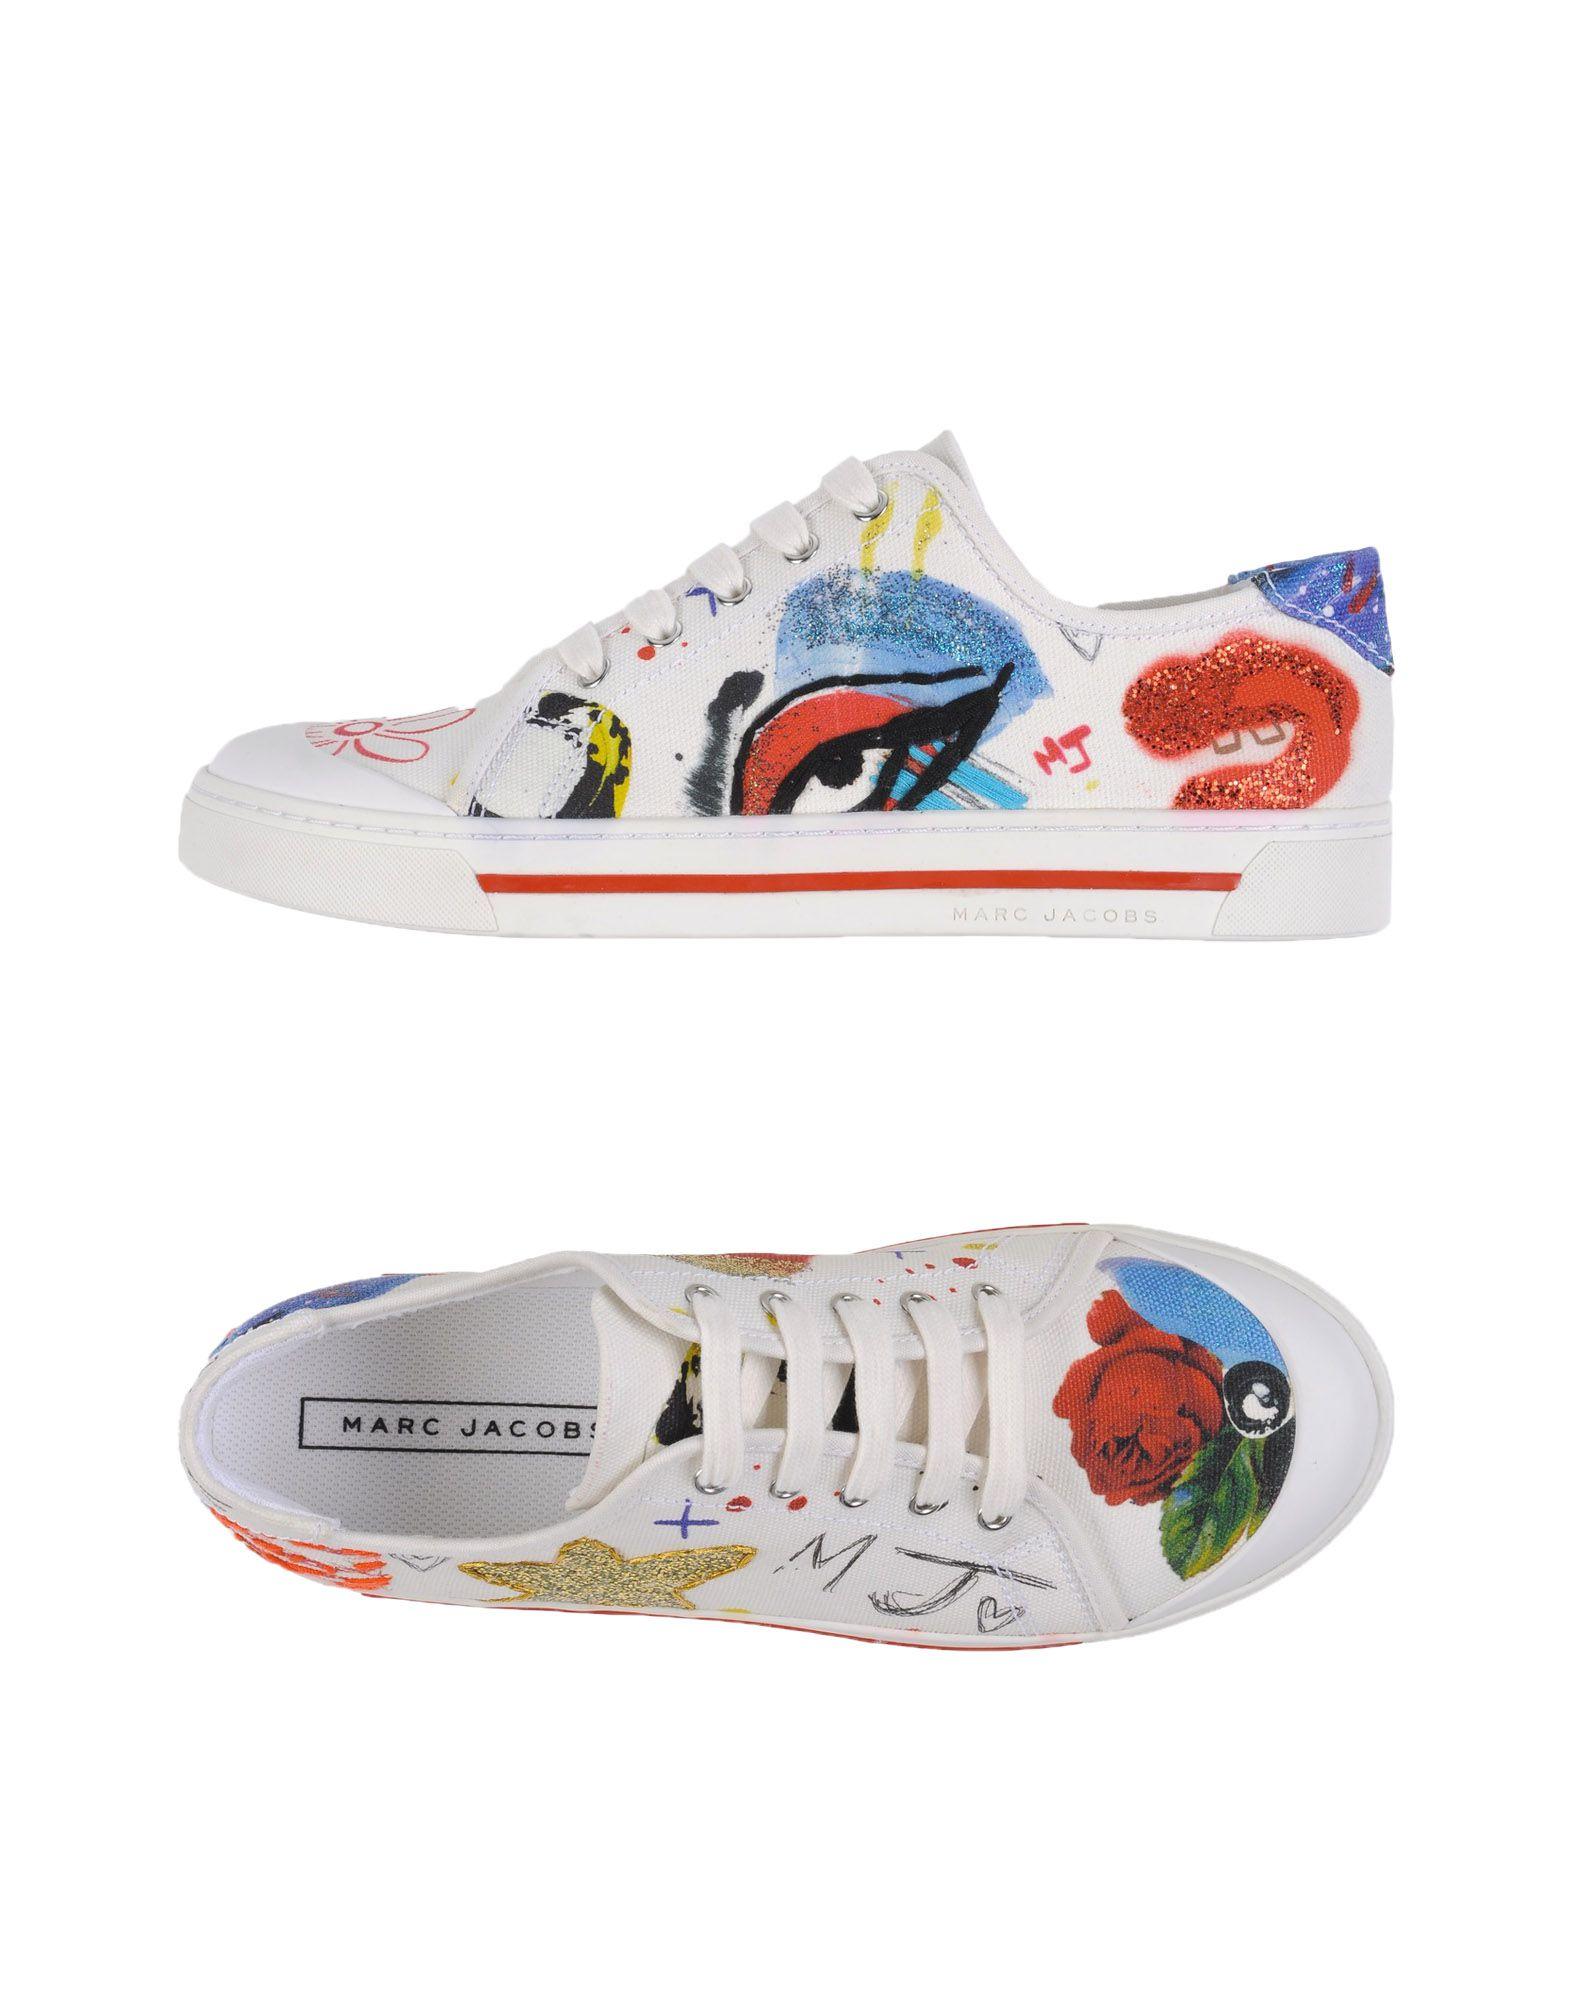 Marc Jacobs Sneakers Damen  11178228WWGut aussehende strapazierfähige Schuhe